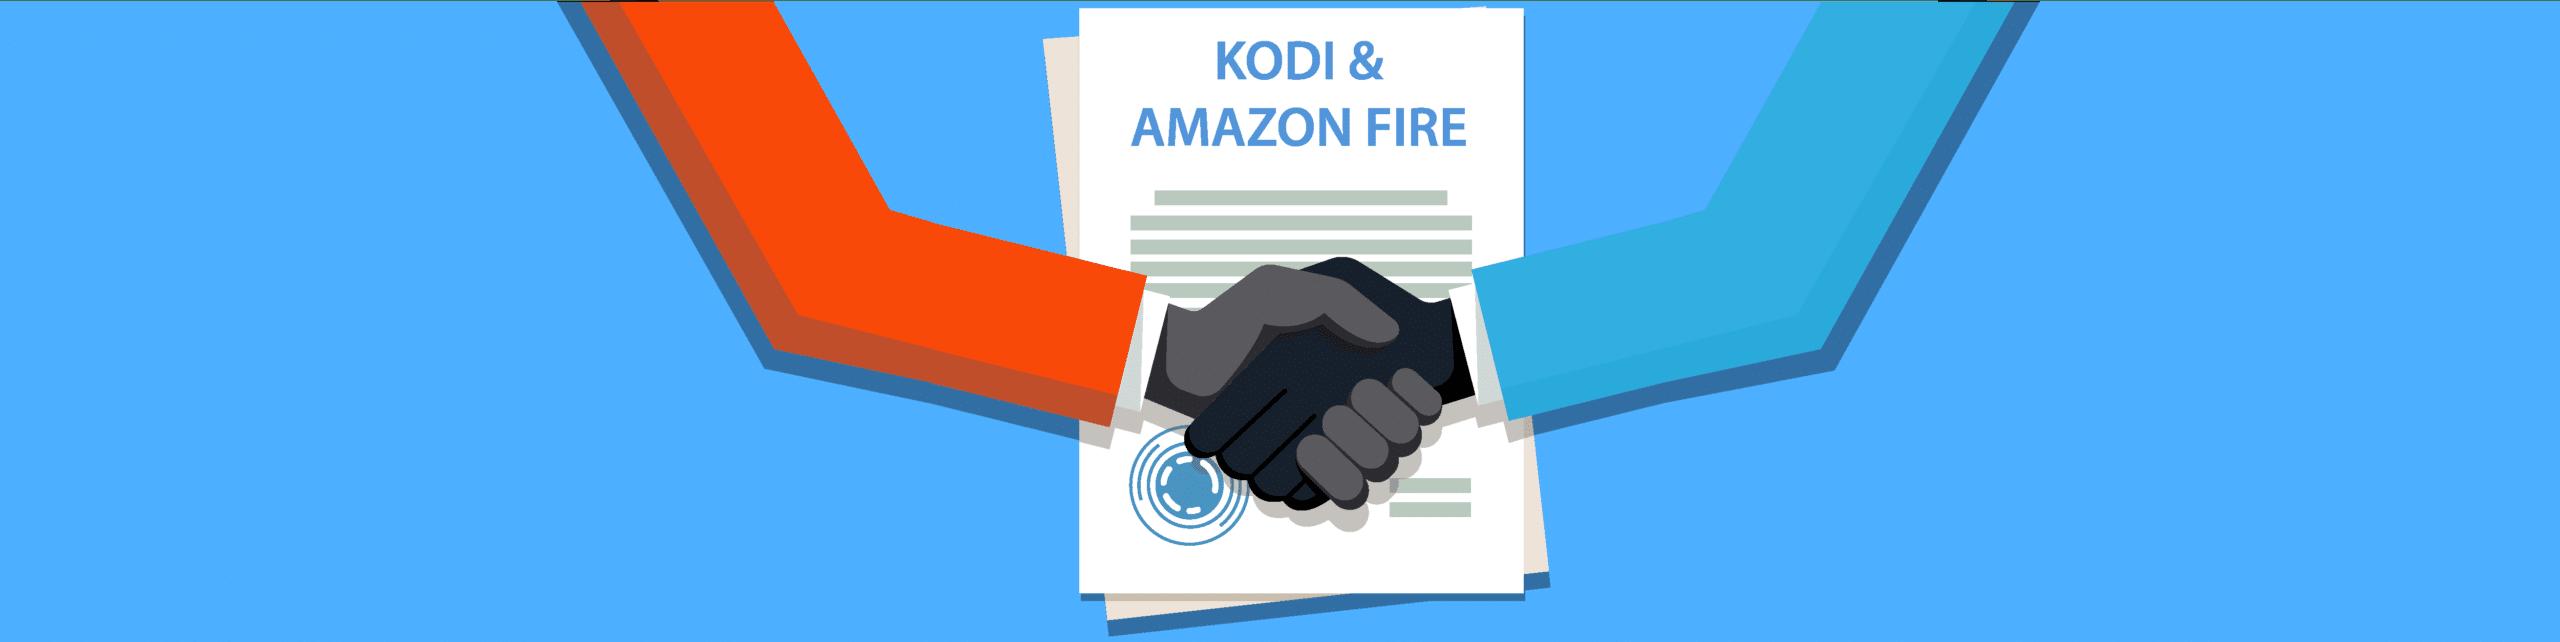 How to Use Kodi on Amazon Fire TV